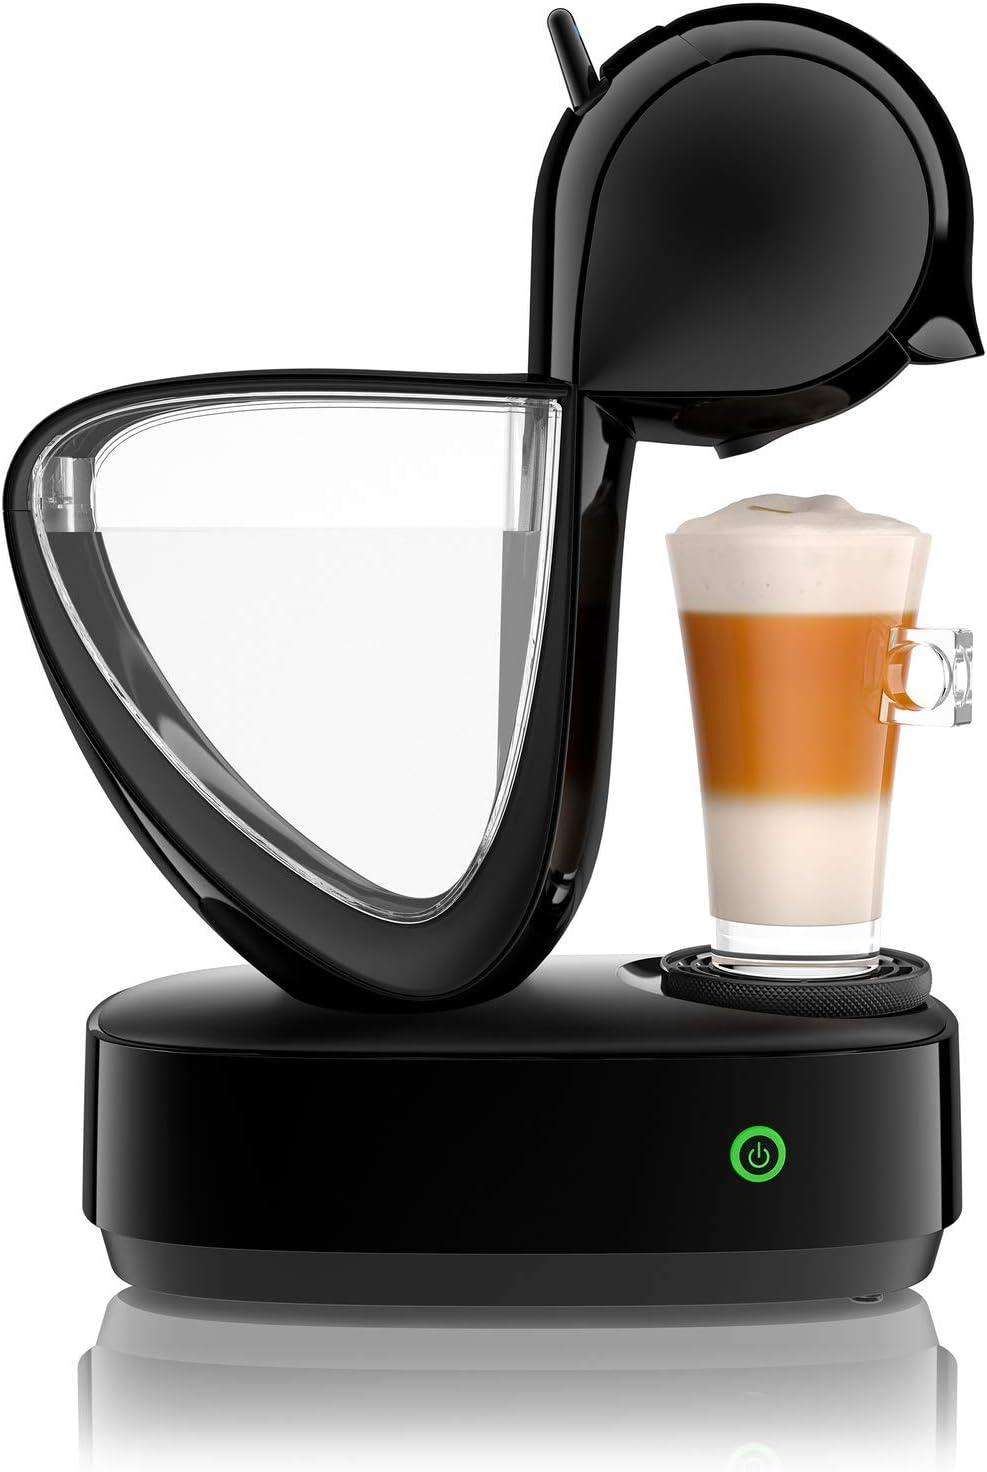 Krups infinissima cafetera café Nescafé Dolce Gusto, Negro: Amazon.es: Hogar